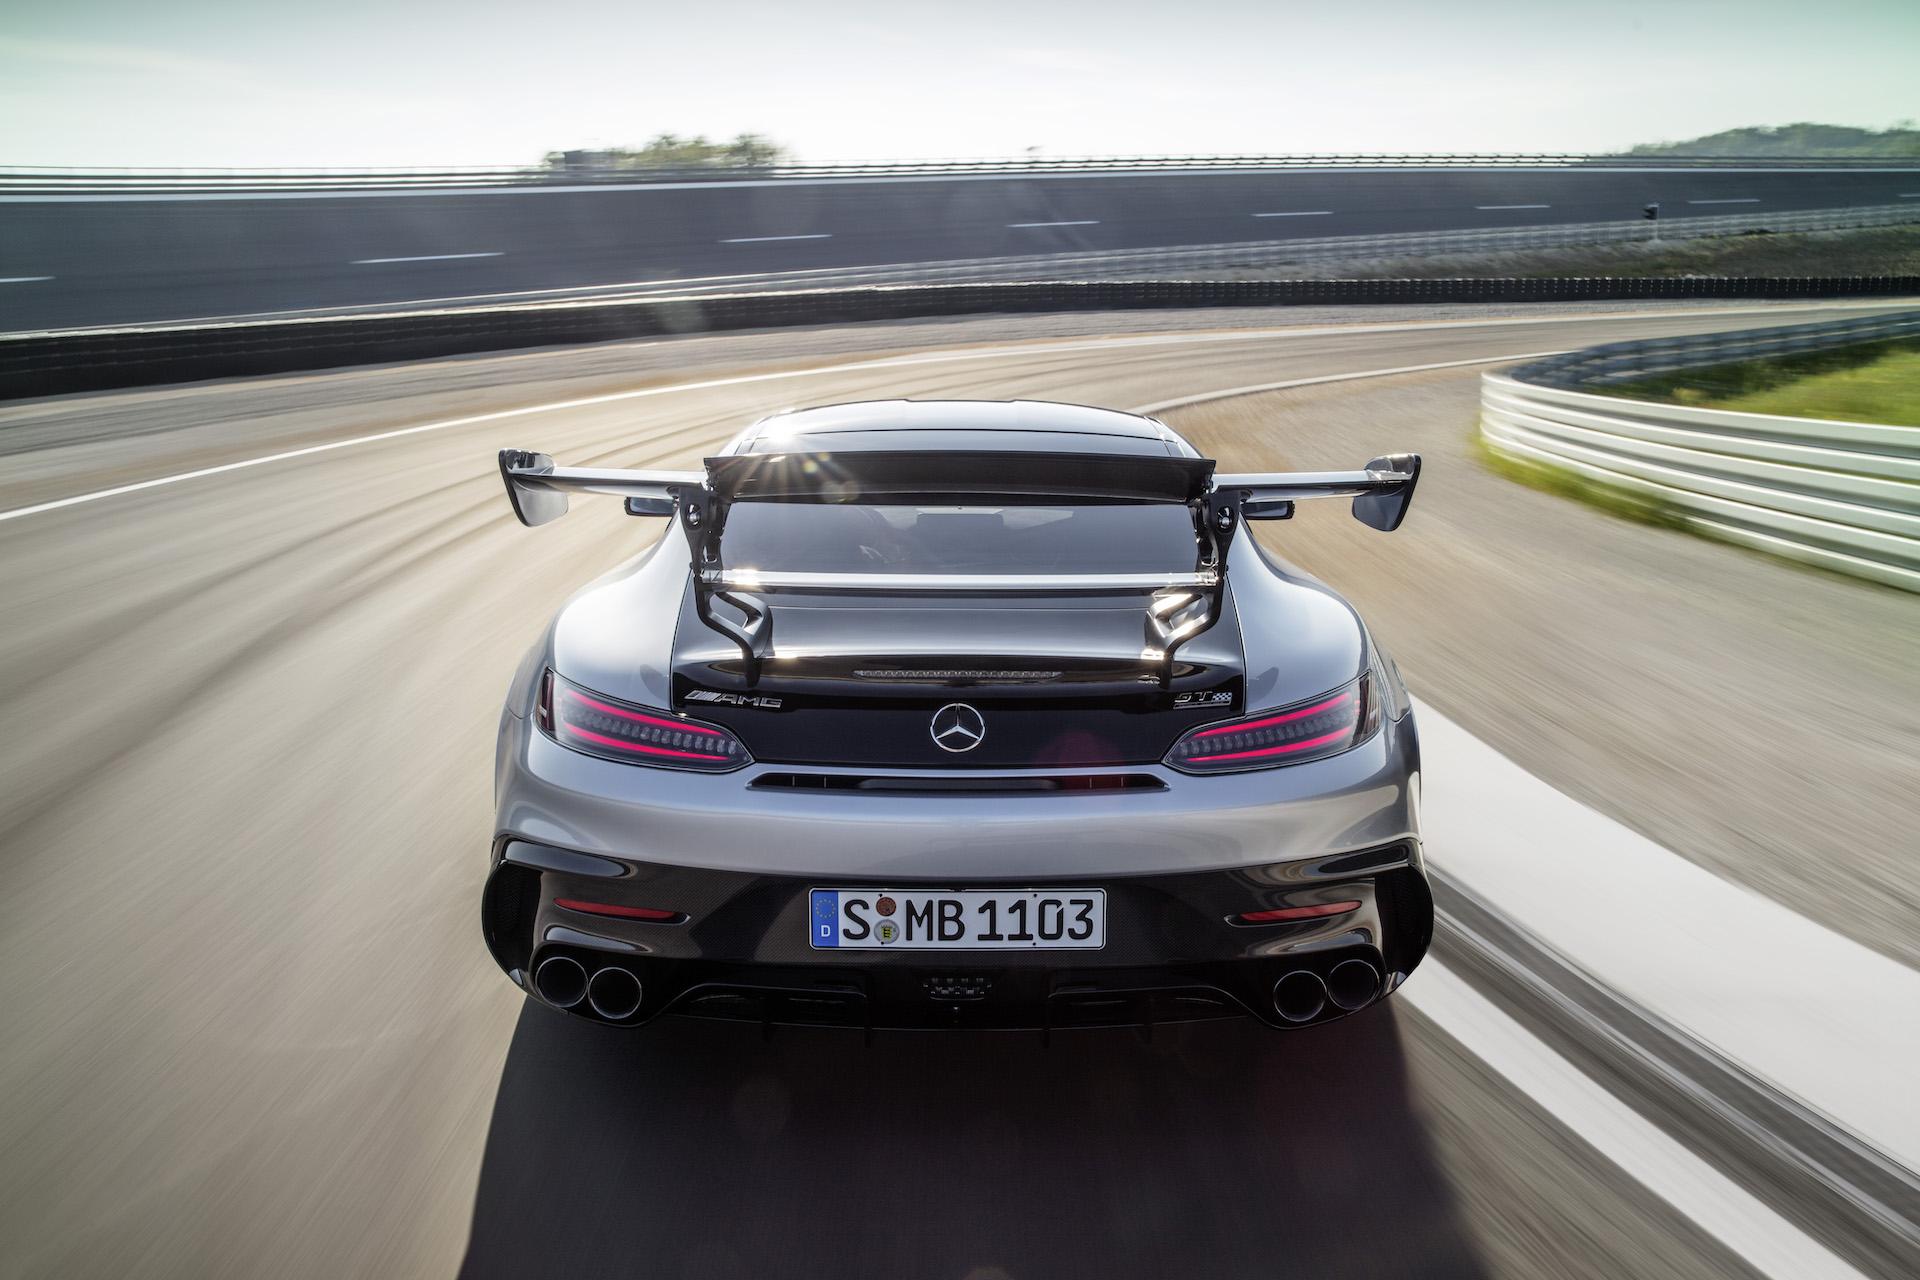 2021 Mercedes-AMG GT Black Series